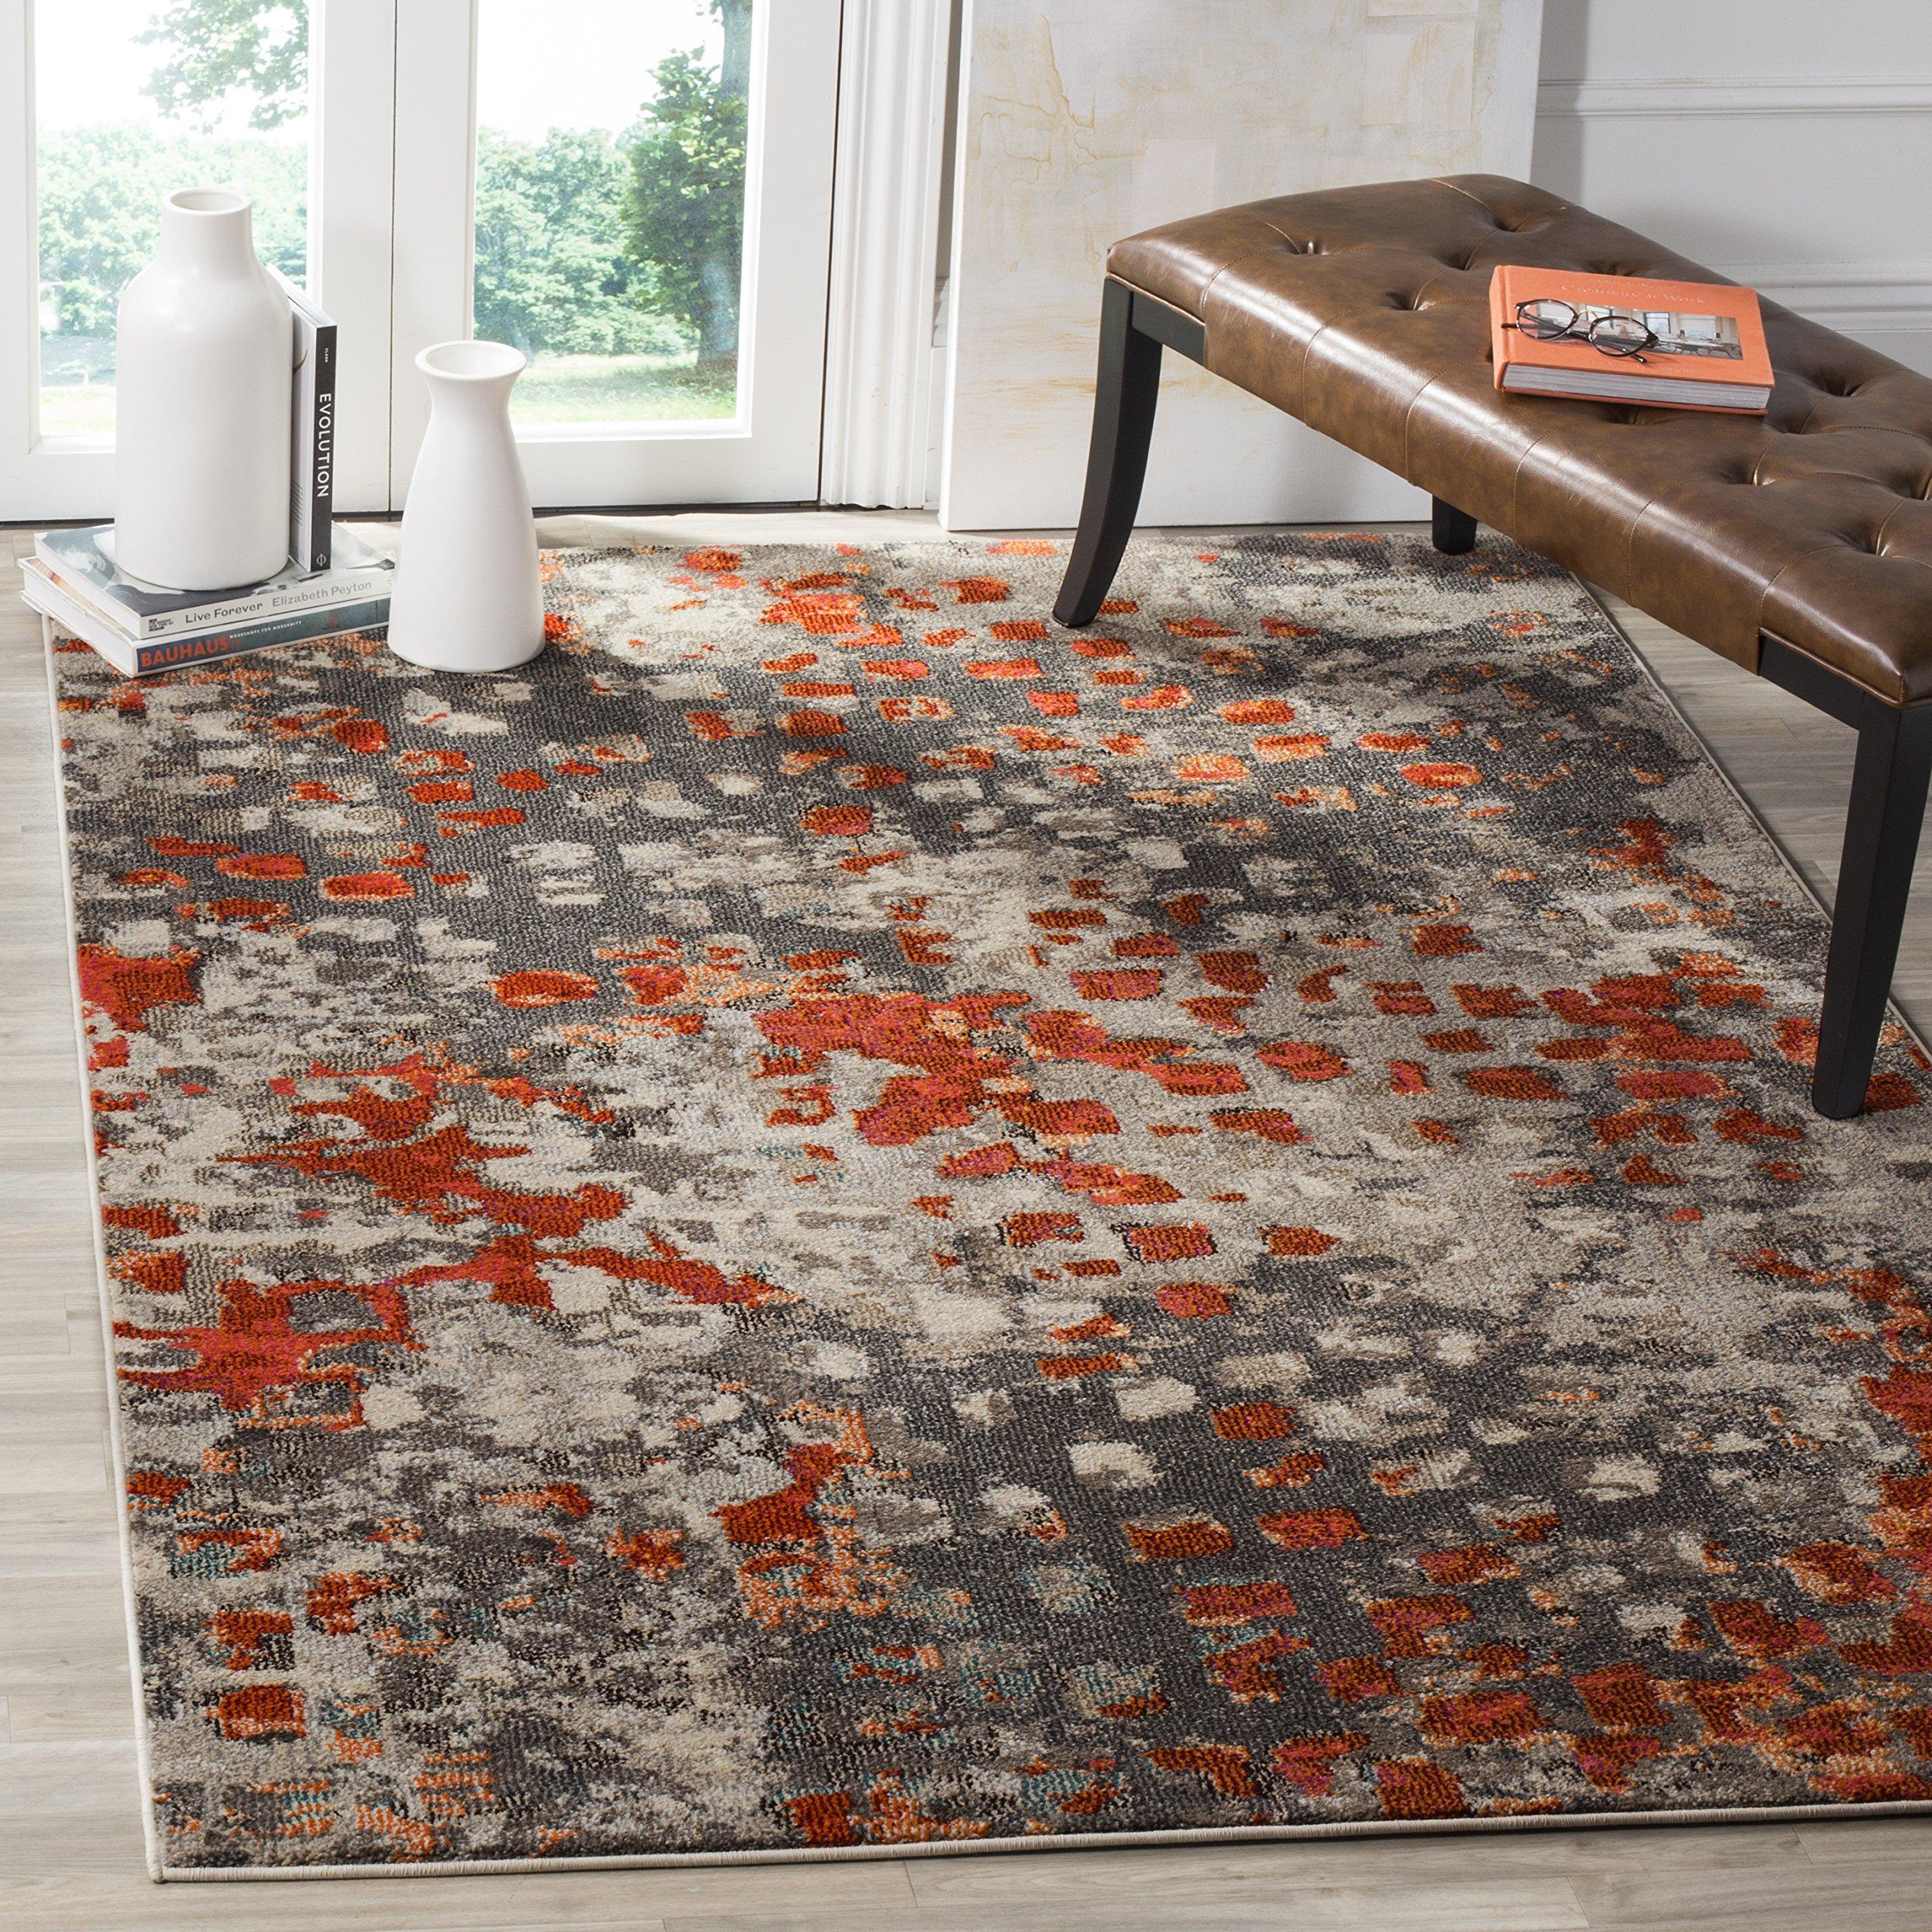 "Safavieh Monaco Collection MNC225H Modern Boho Abstract Watercolor Area Rug, 5' 1"" x 7' 7"", Grey/Orange"